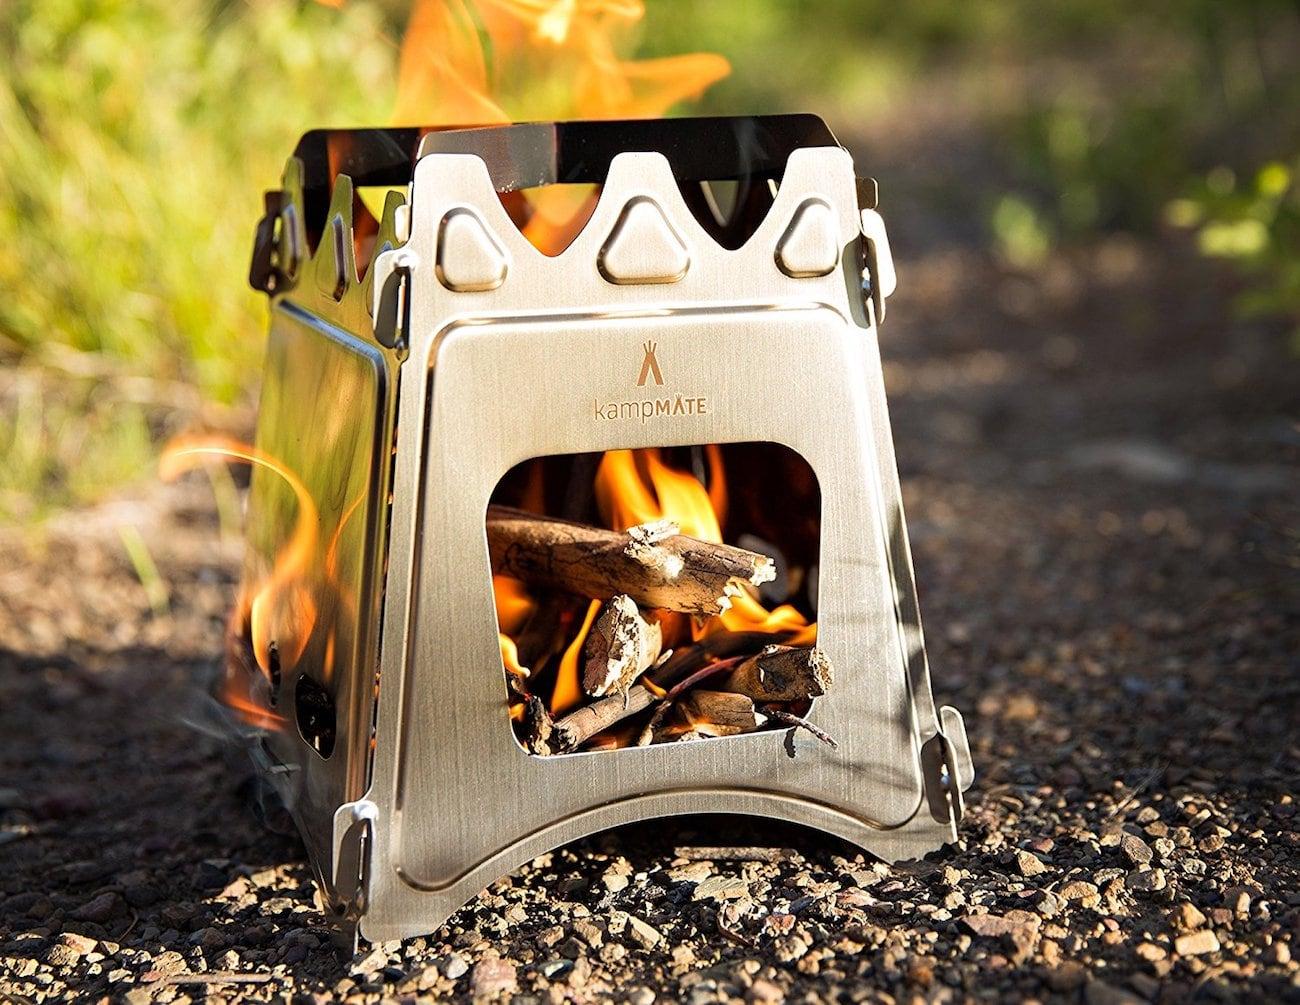 WoodFlame Portable Wood Burning Stove